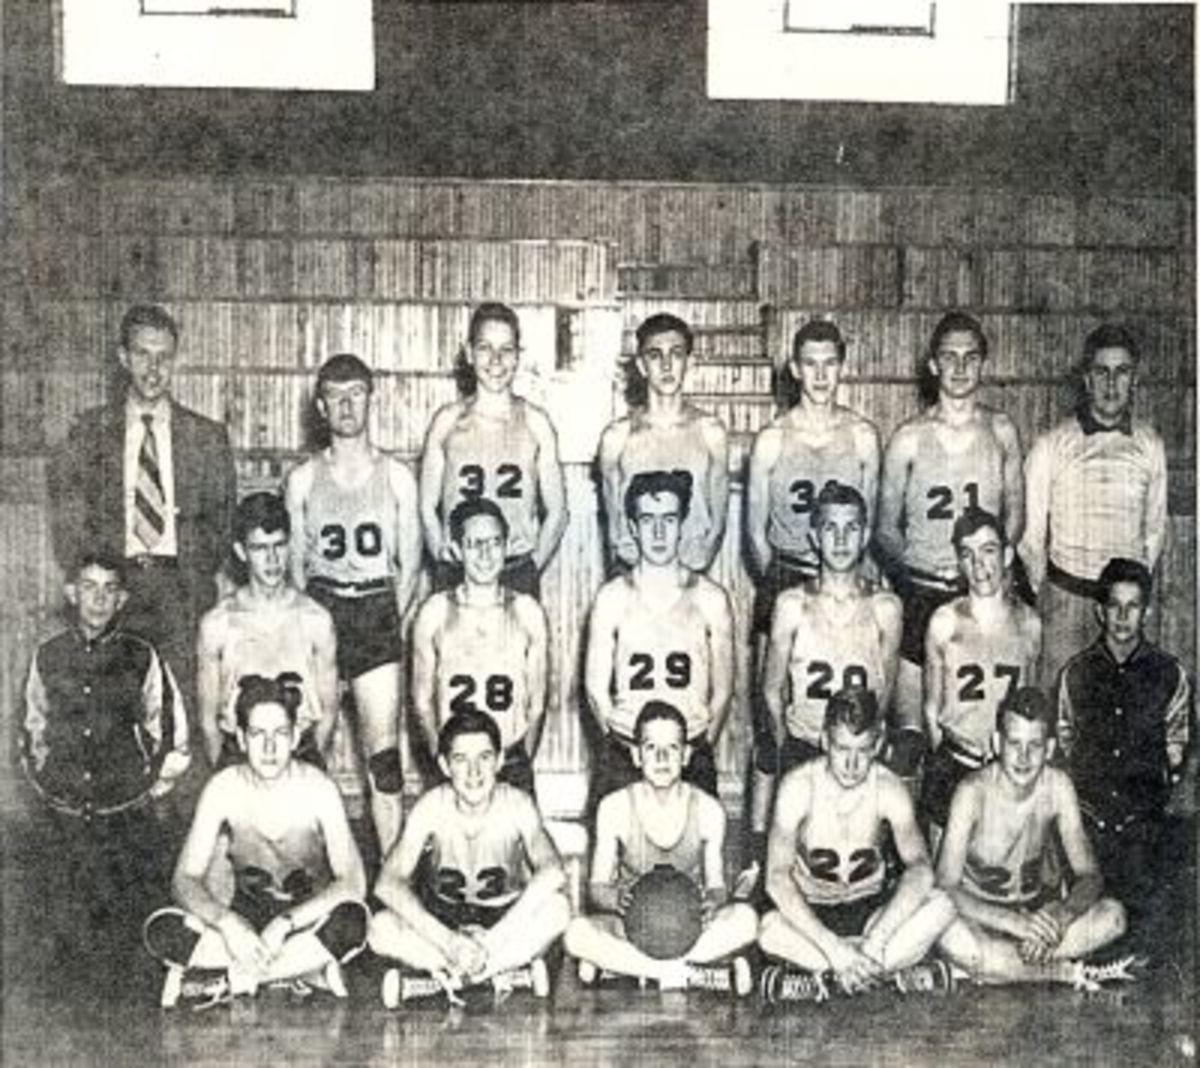 1949-50 PENDLETON HIGH SCHOOL BOYS BASKETBALL TEAM